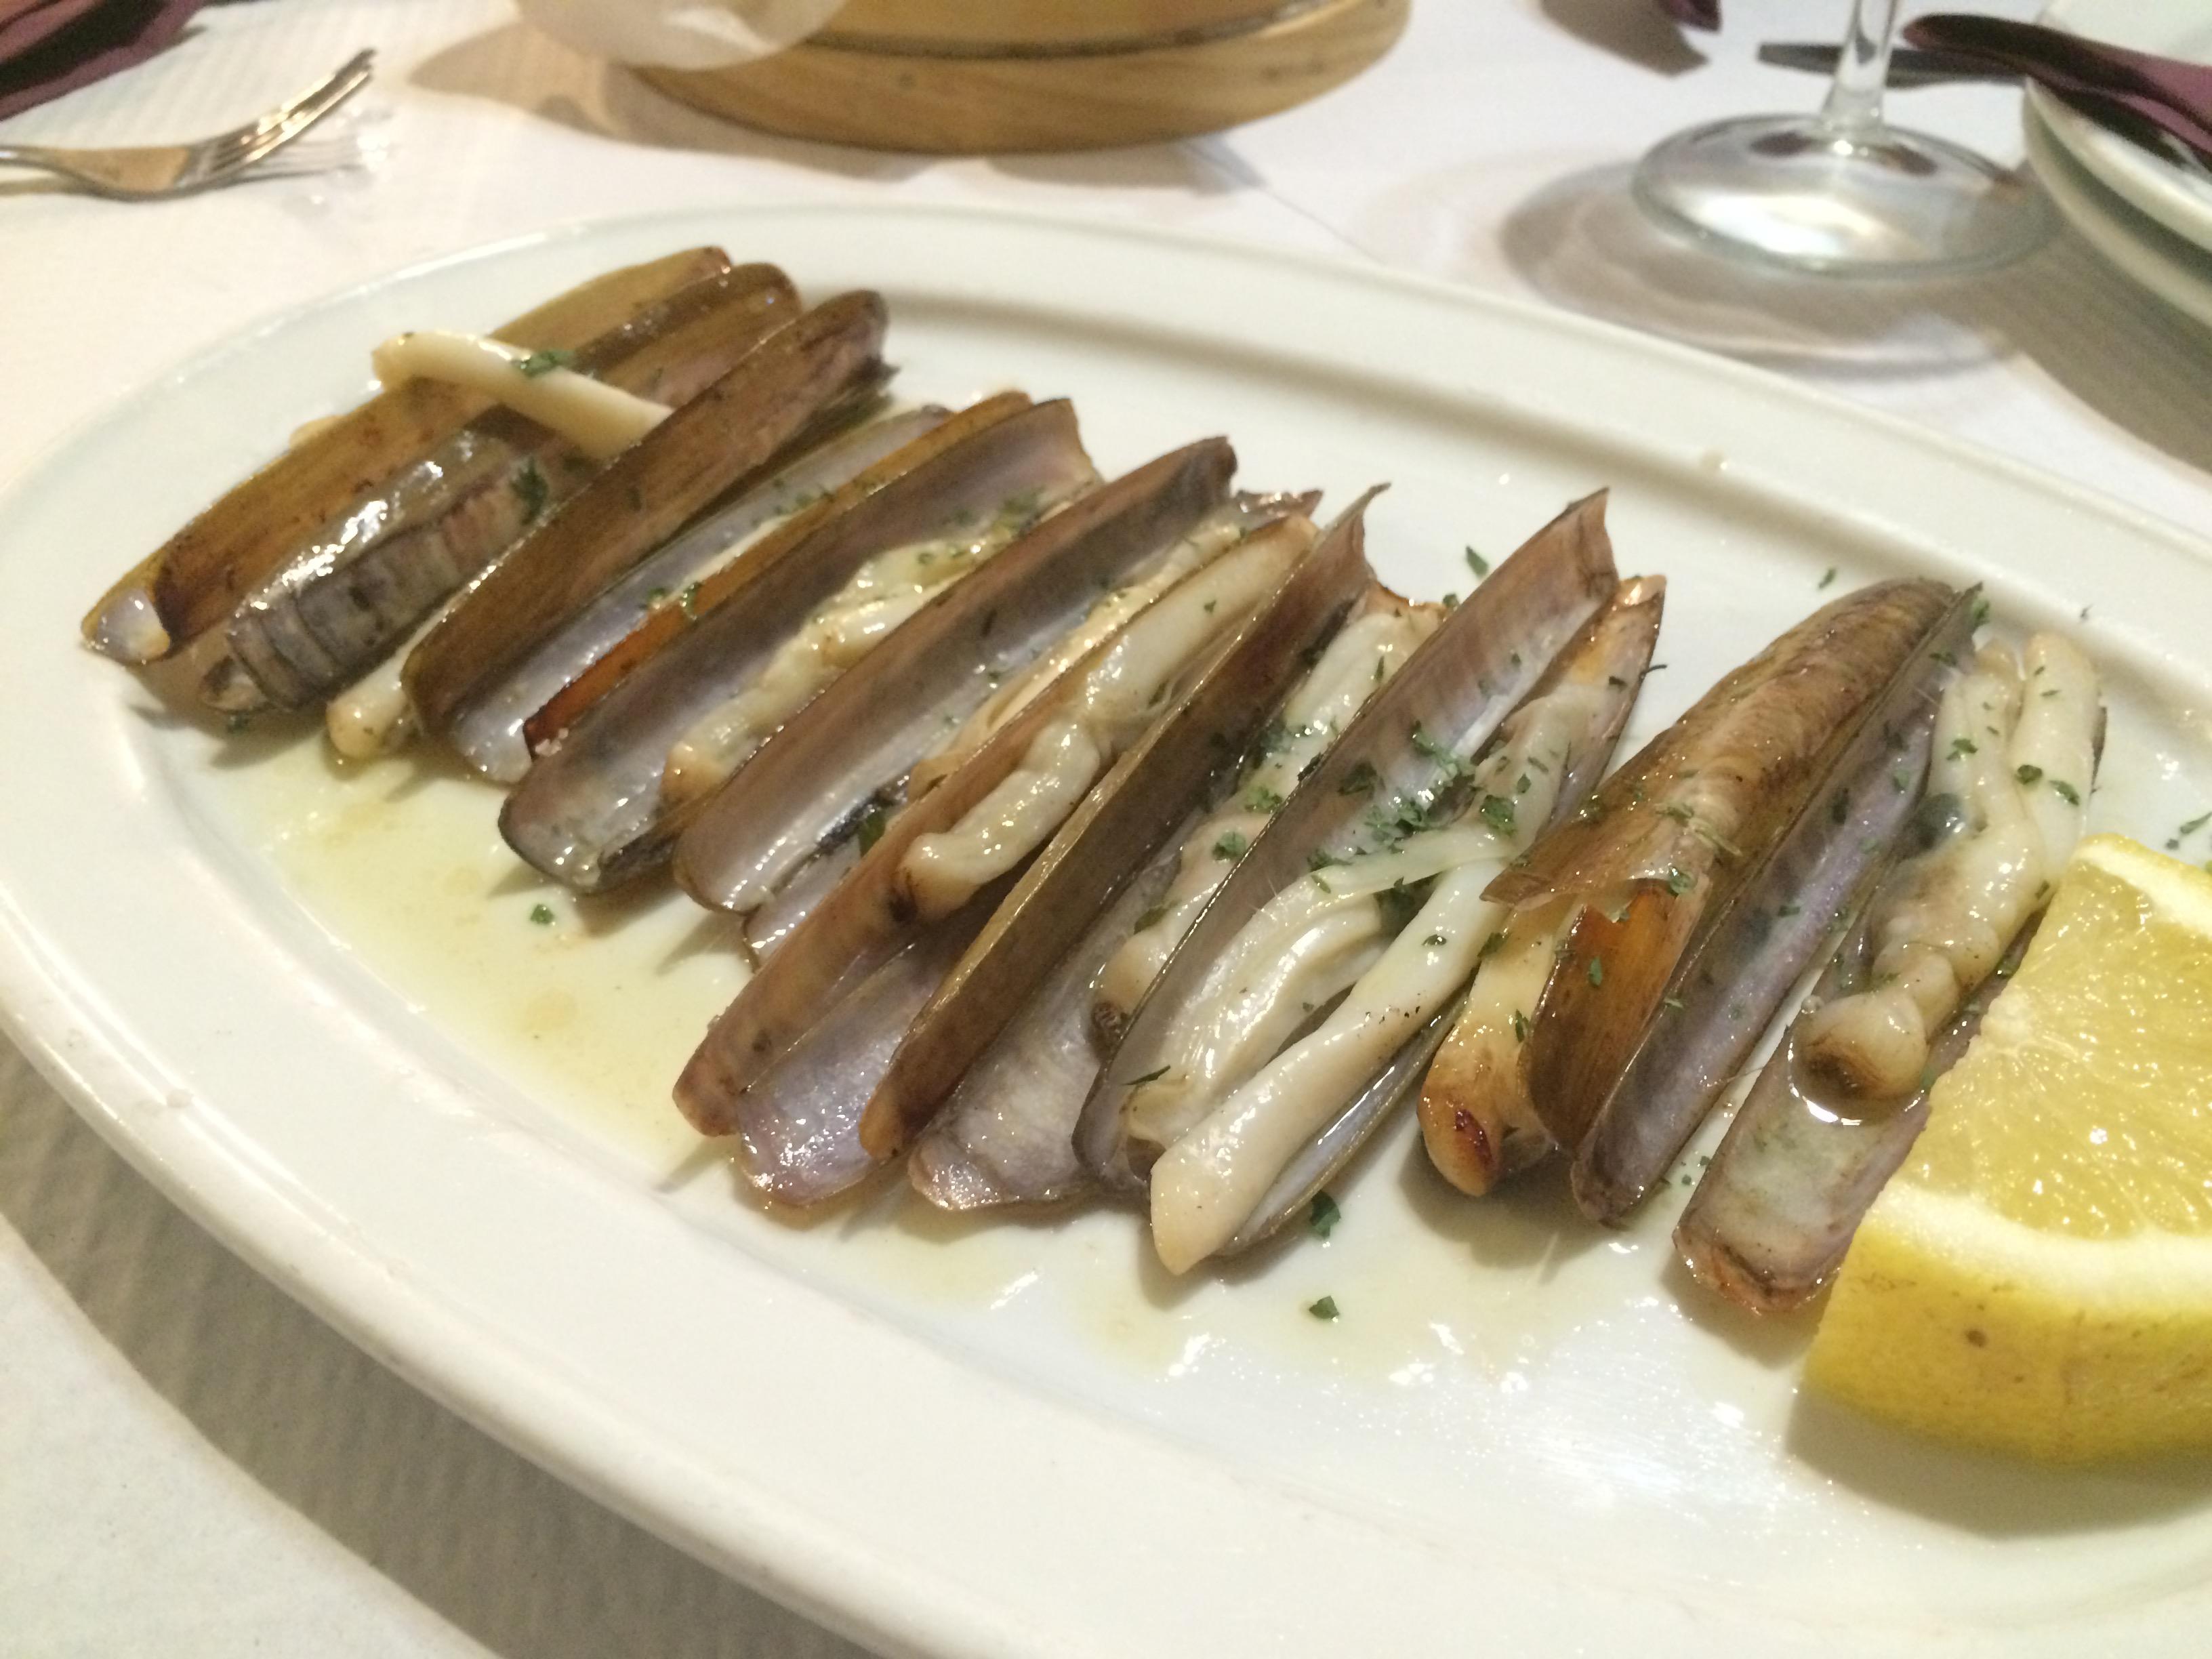 Restaurante Rías Baixas 2 (seafood restaurant) - Vigo, Spain